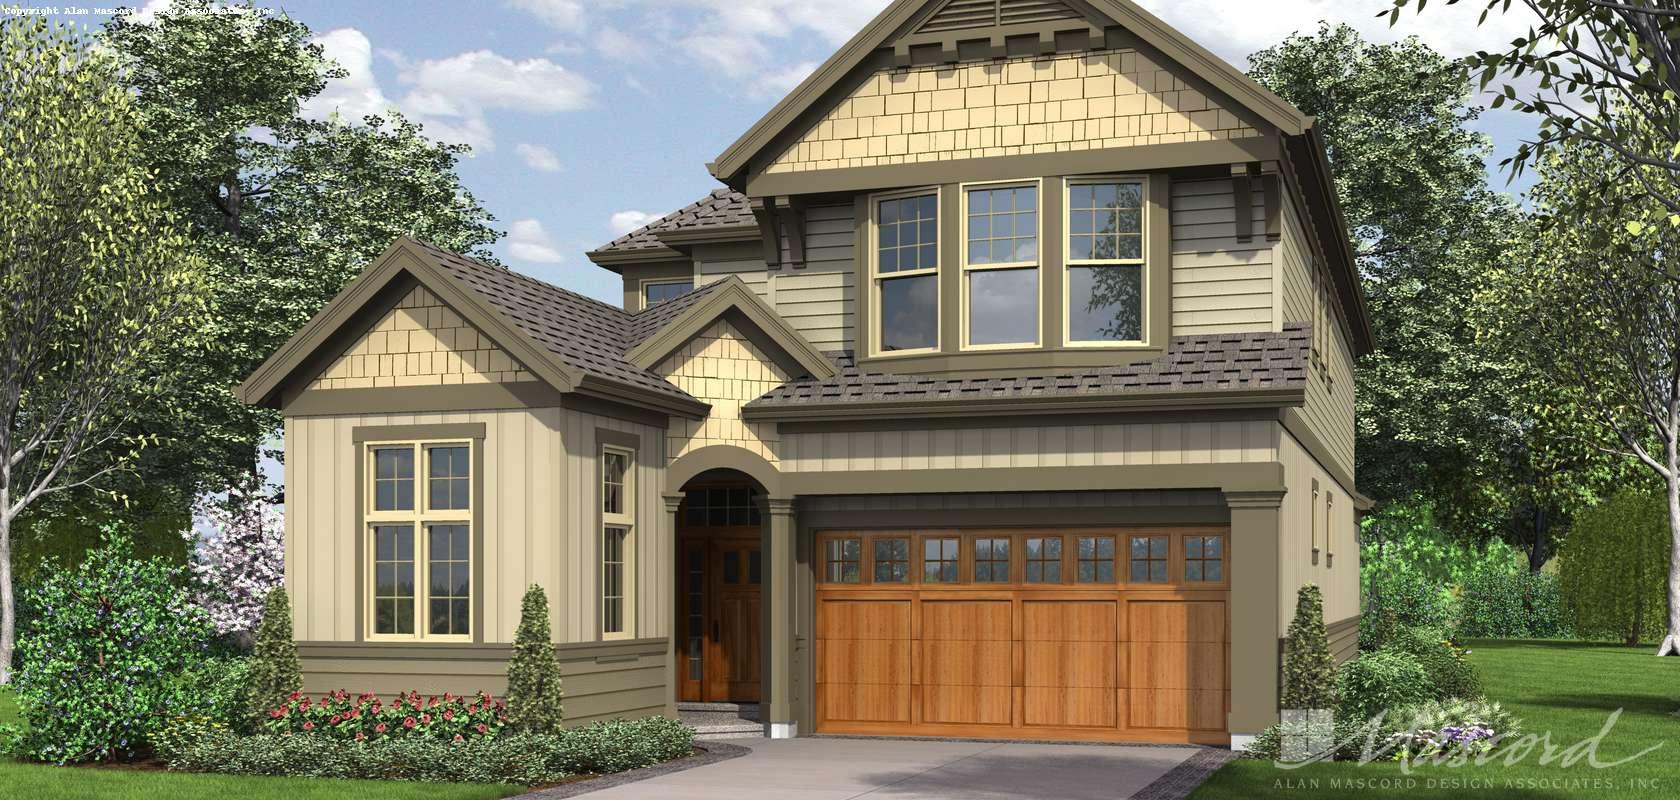 Mascord House Plan 2398: The Williams